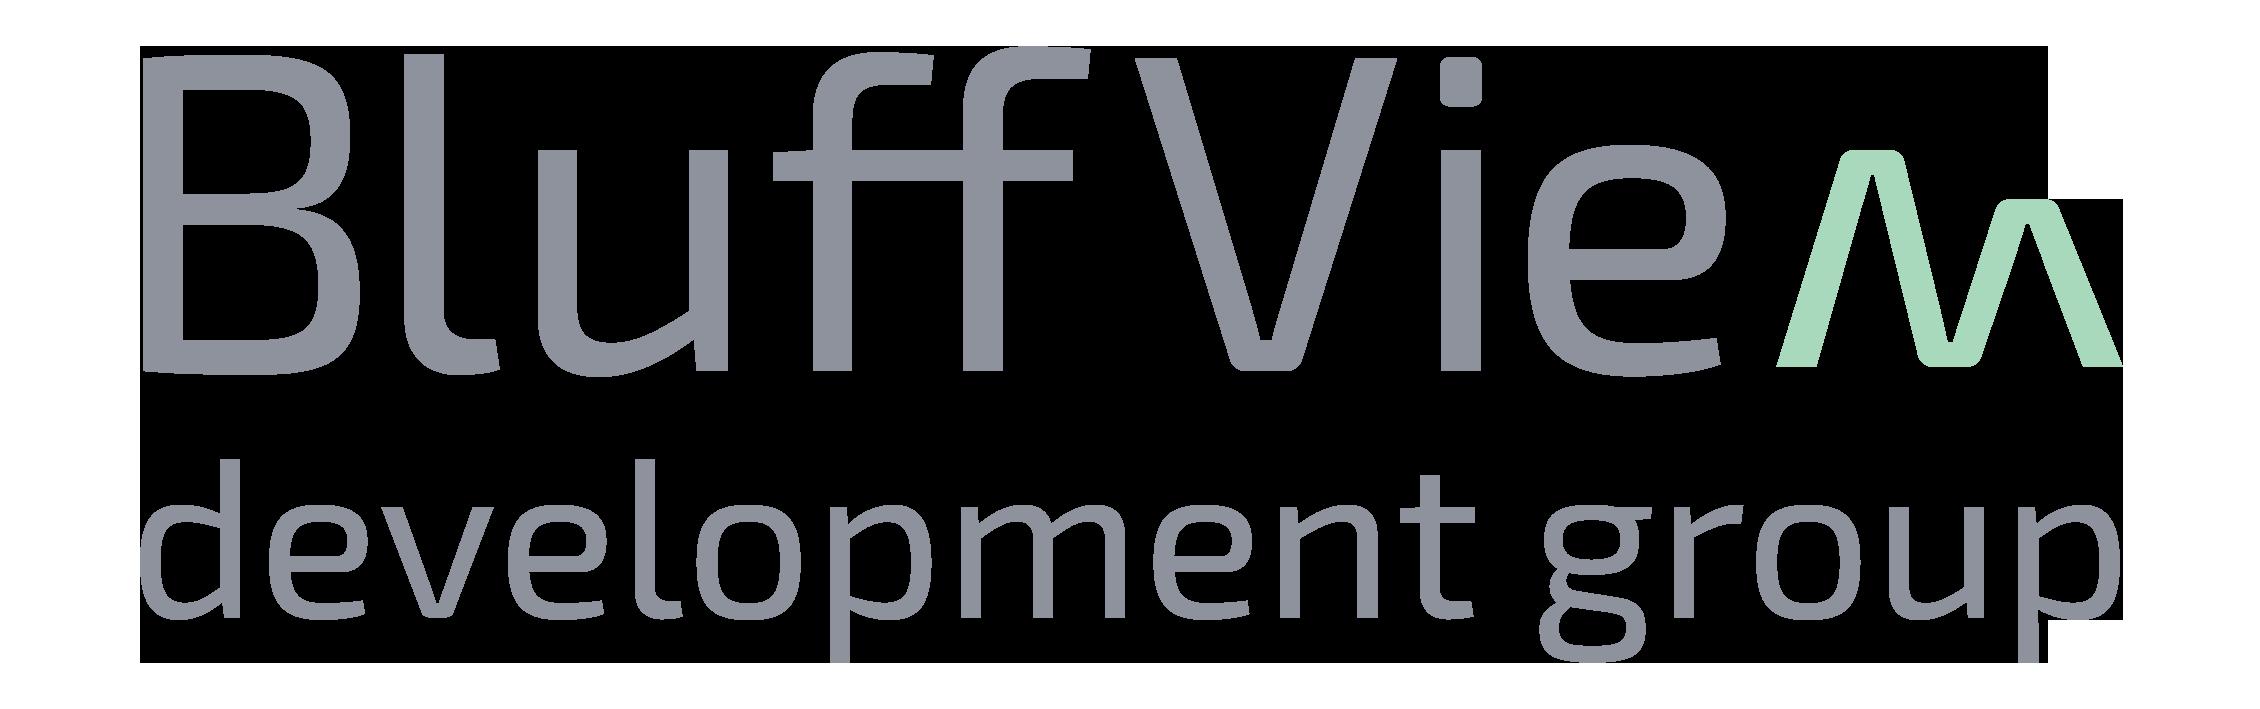 Bluffview Development Group